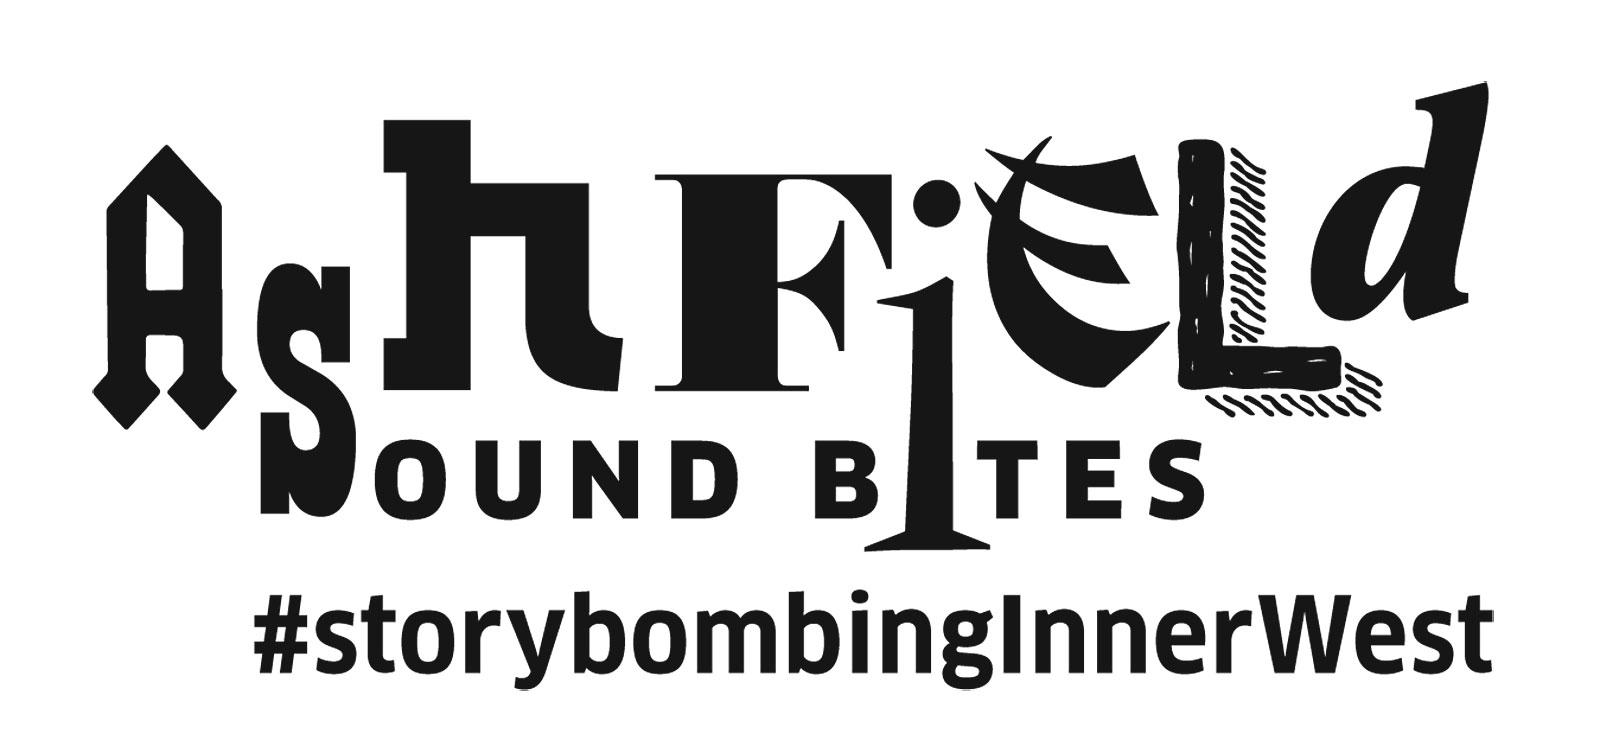 Ashfield Sound Bites